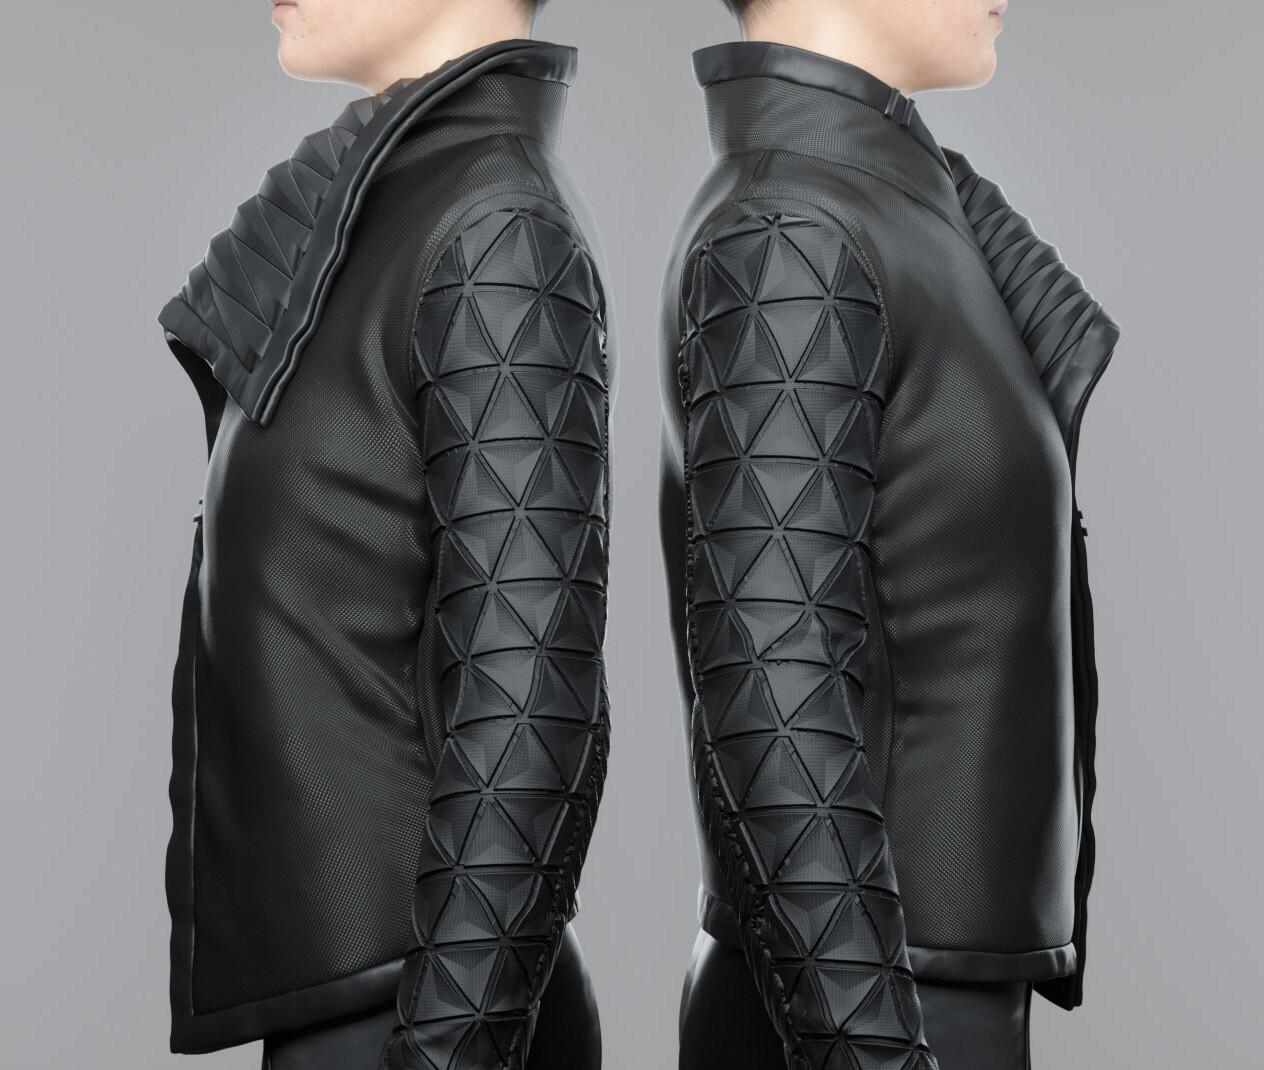 Travis davids jacket back to back